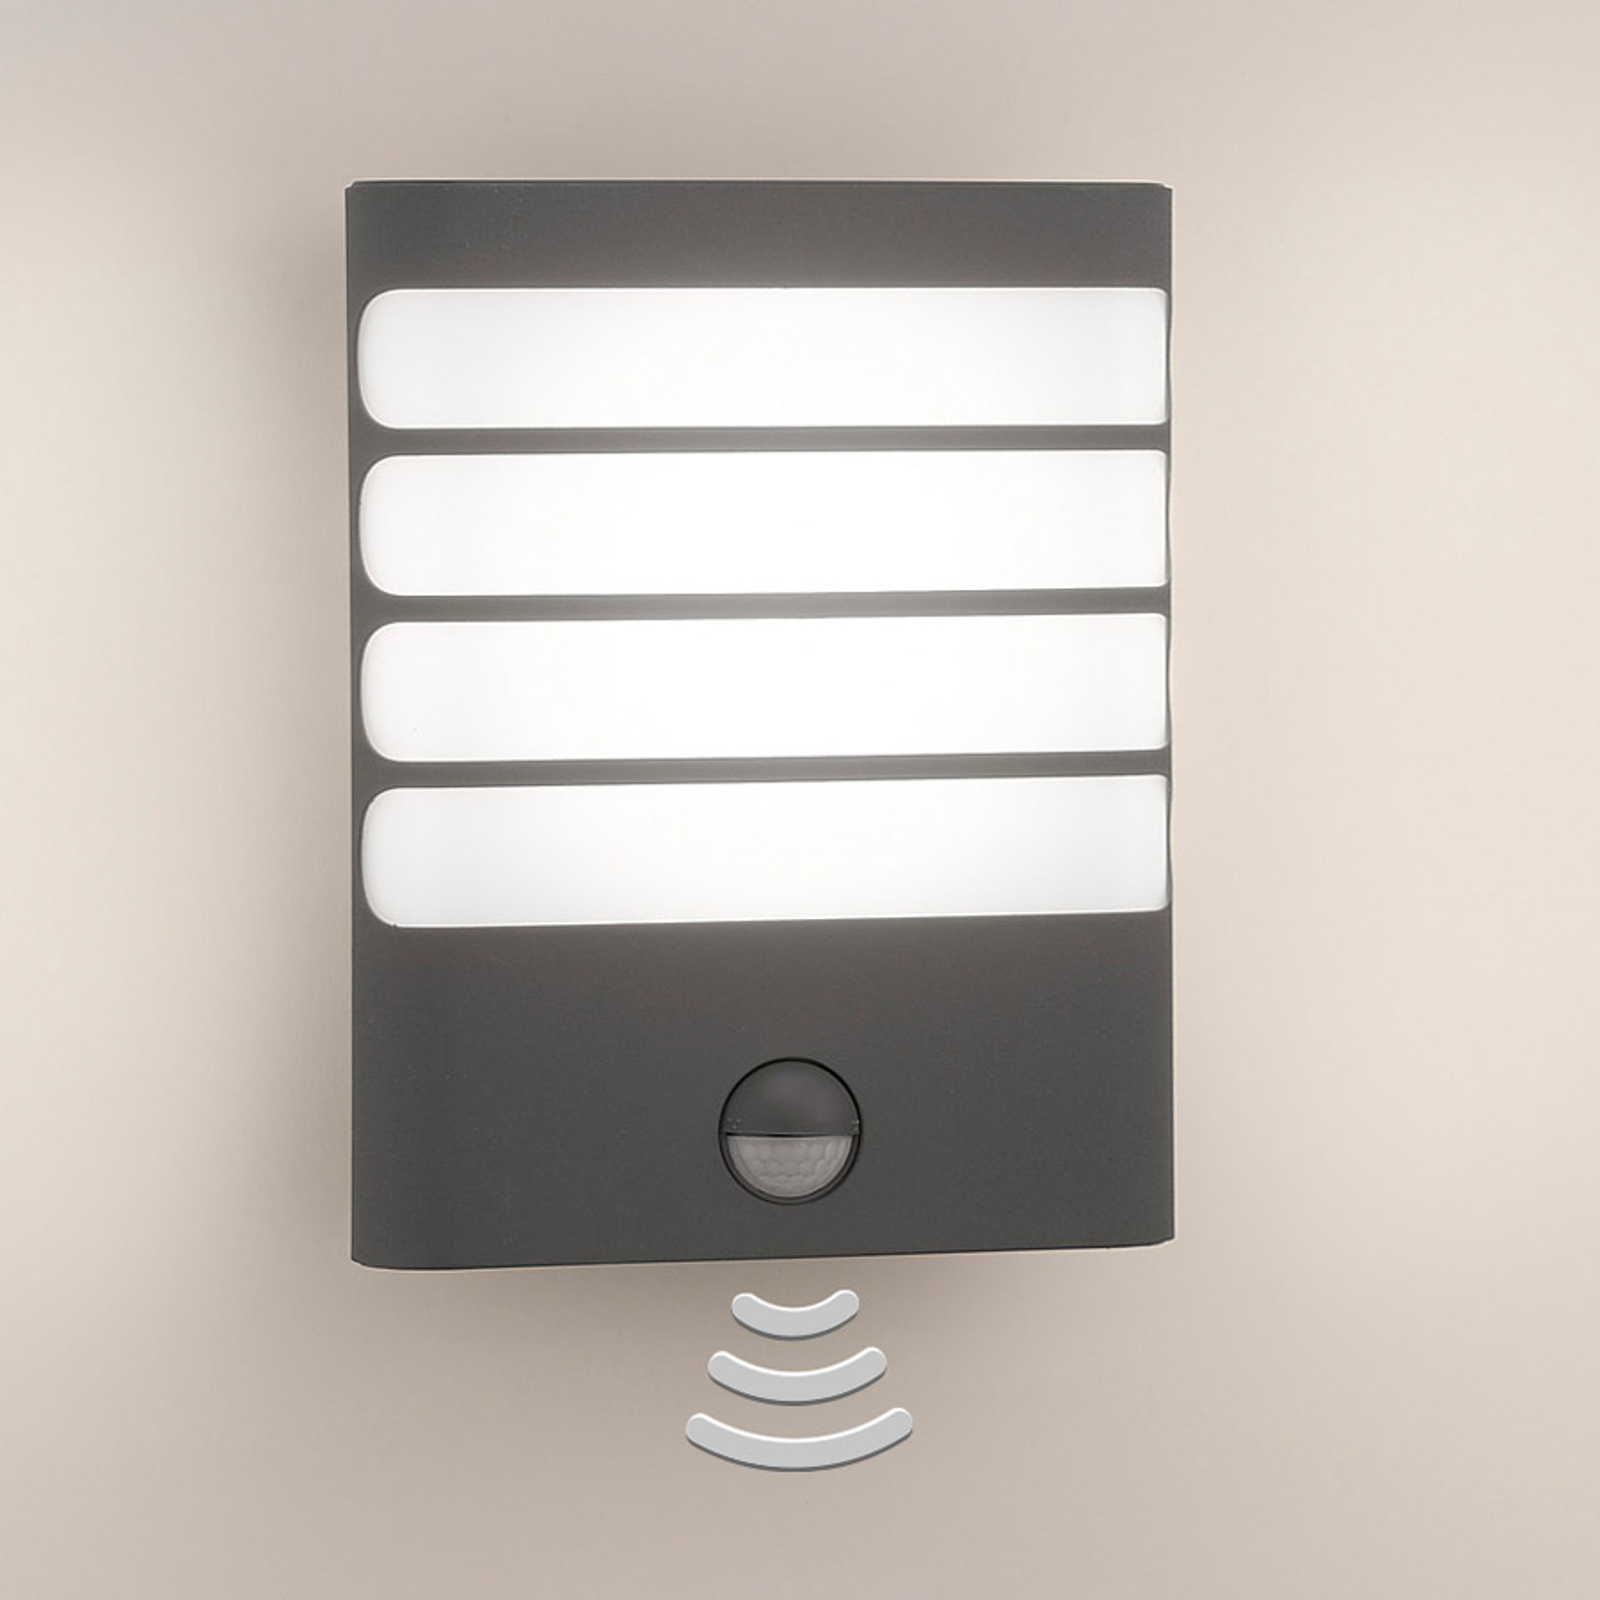 Philips Raccoon LED-væglampe antracit